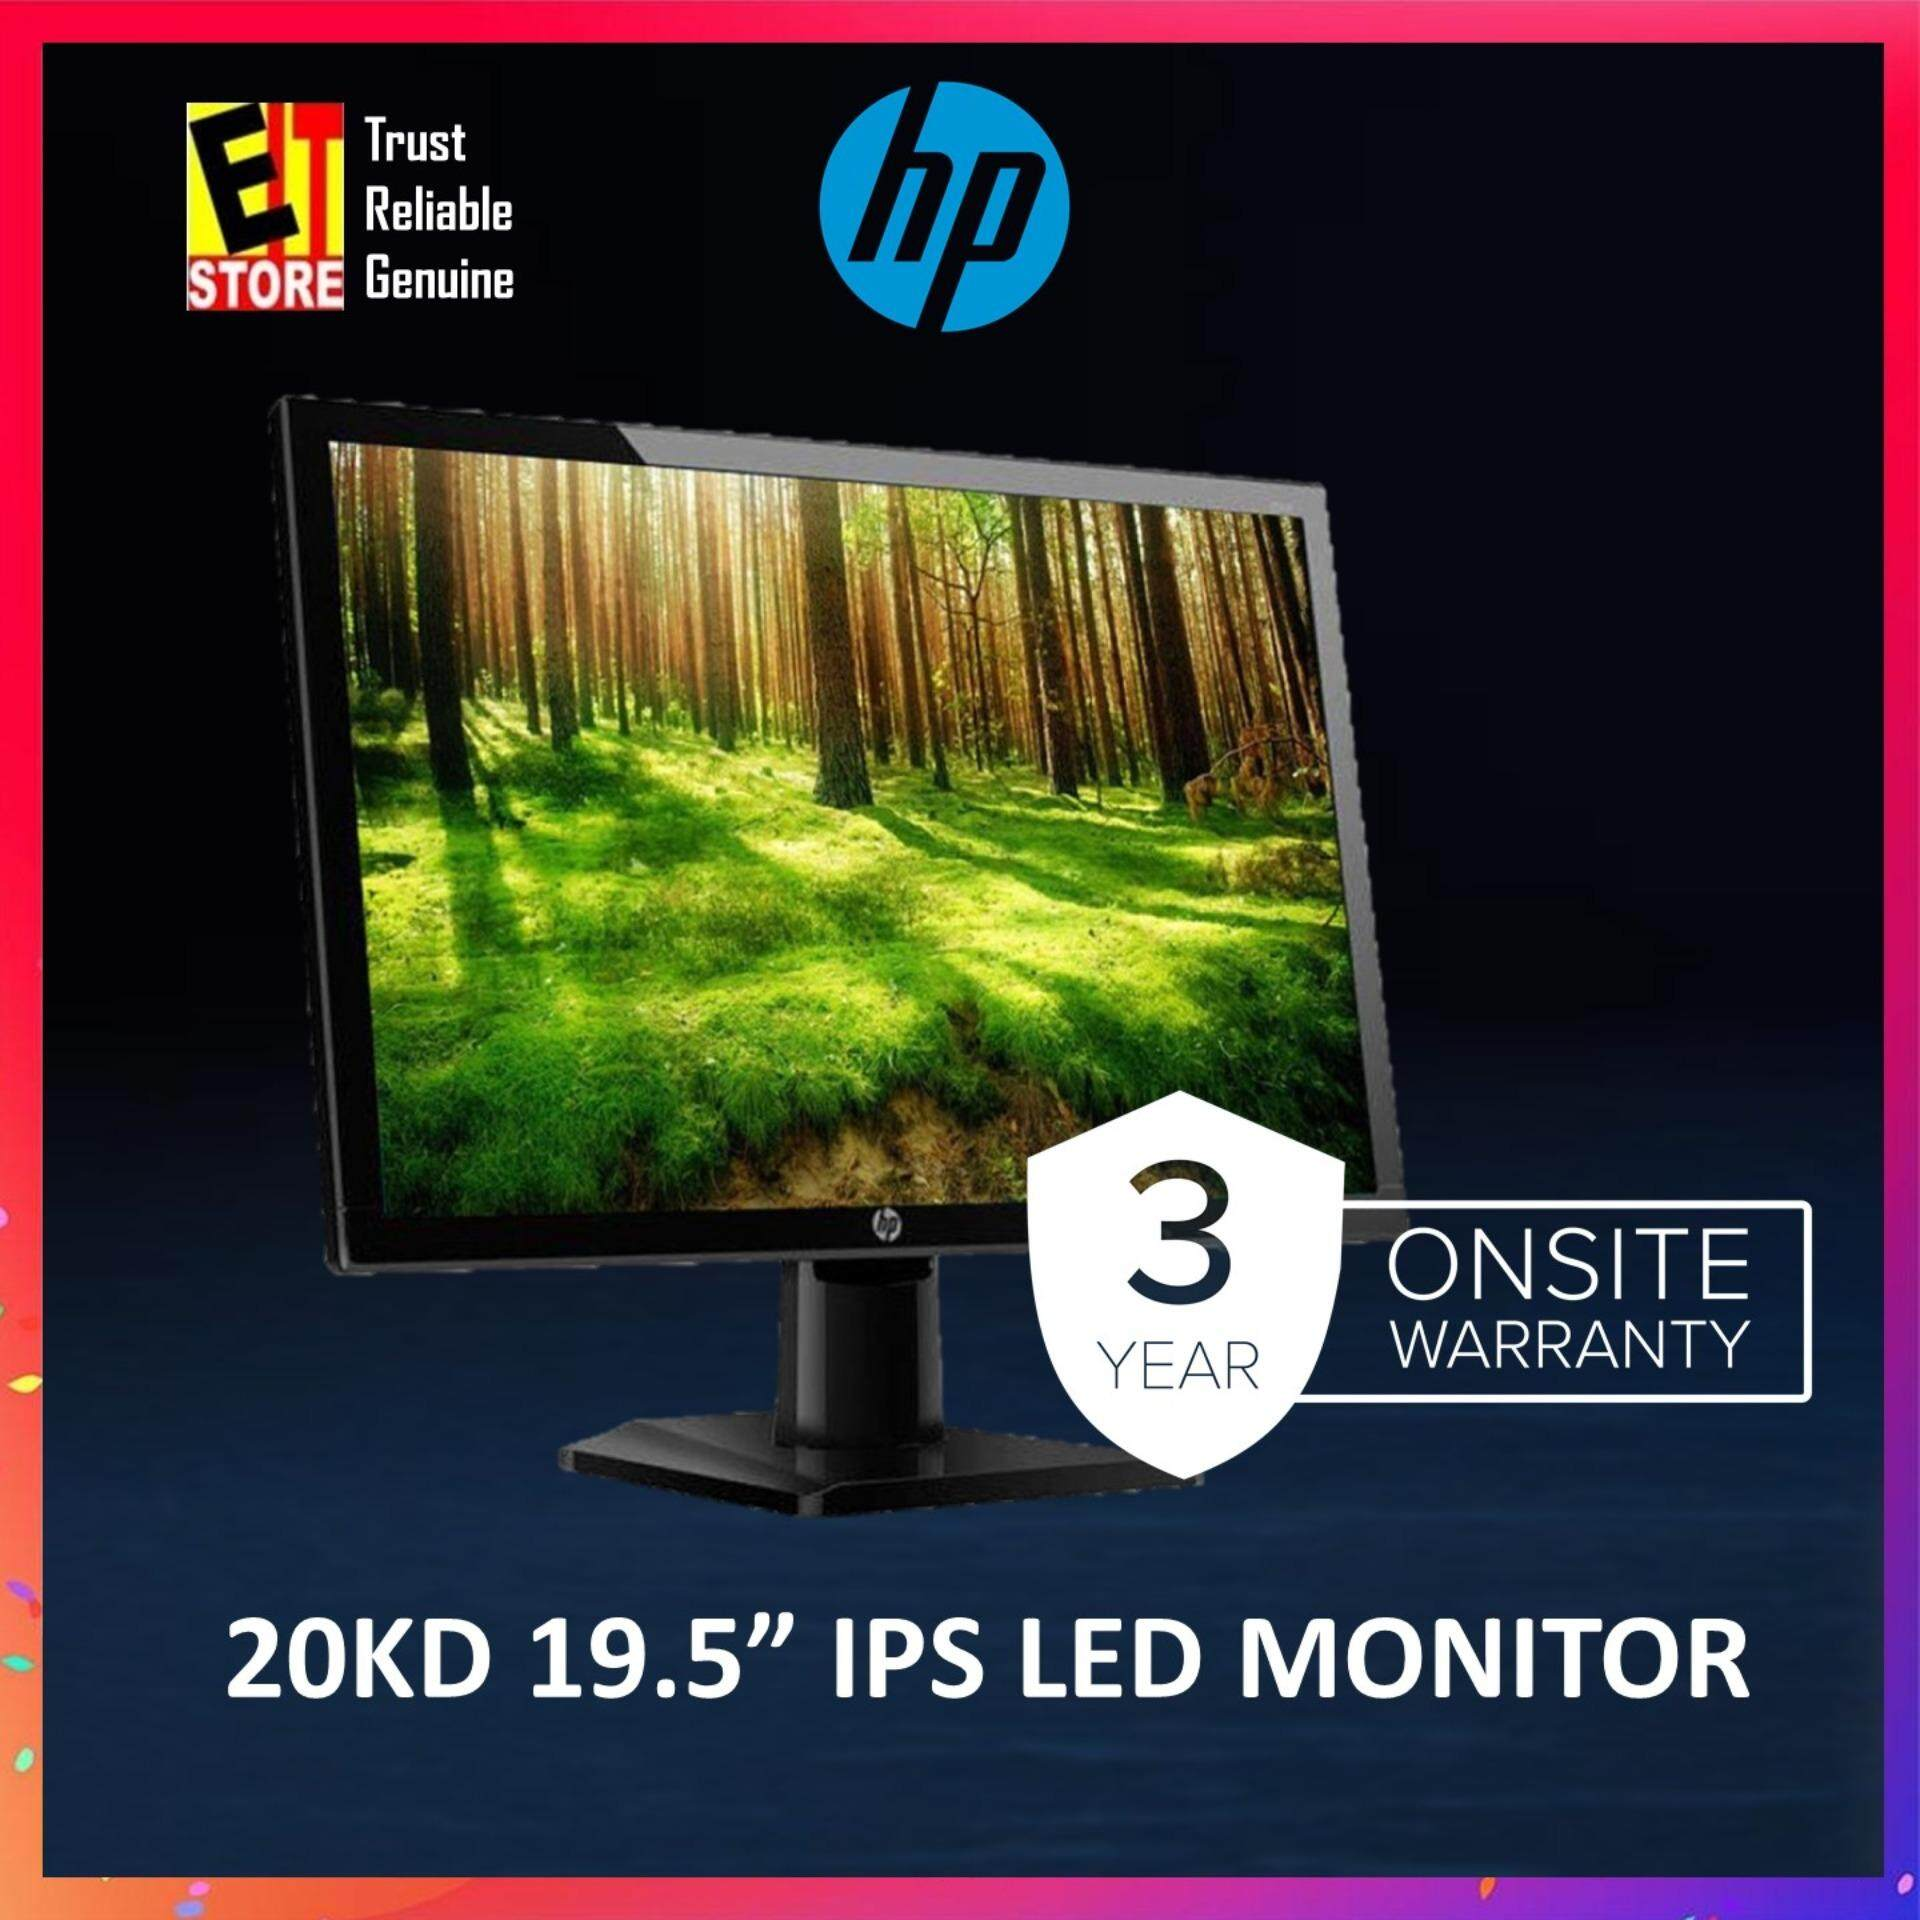 HP 20kd 19 5-inch Monitor (3 years onsite warranty)